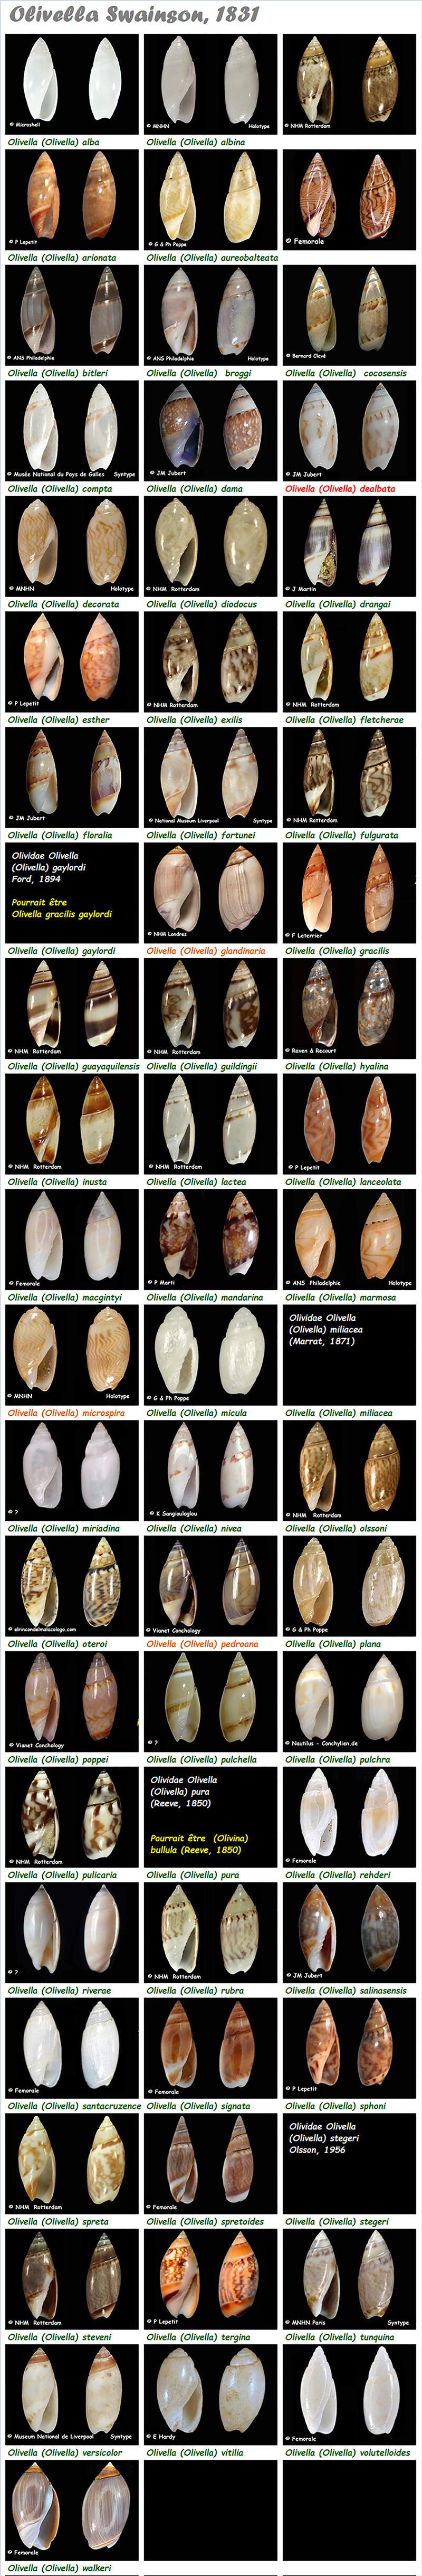 Olividae Olivella - Le genre, les espèces, la planche Olivel34